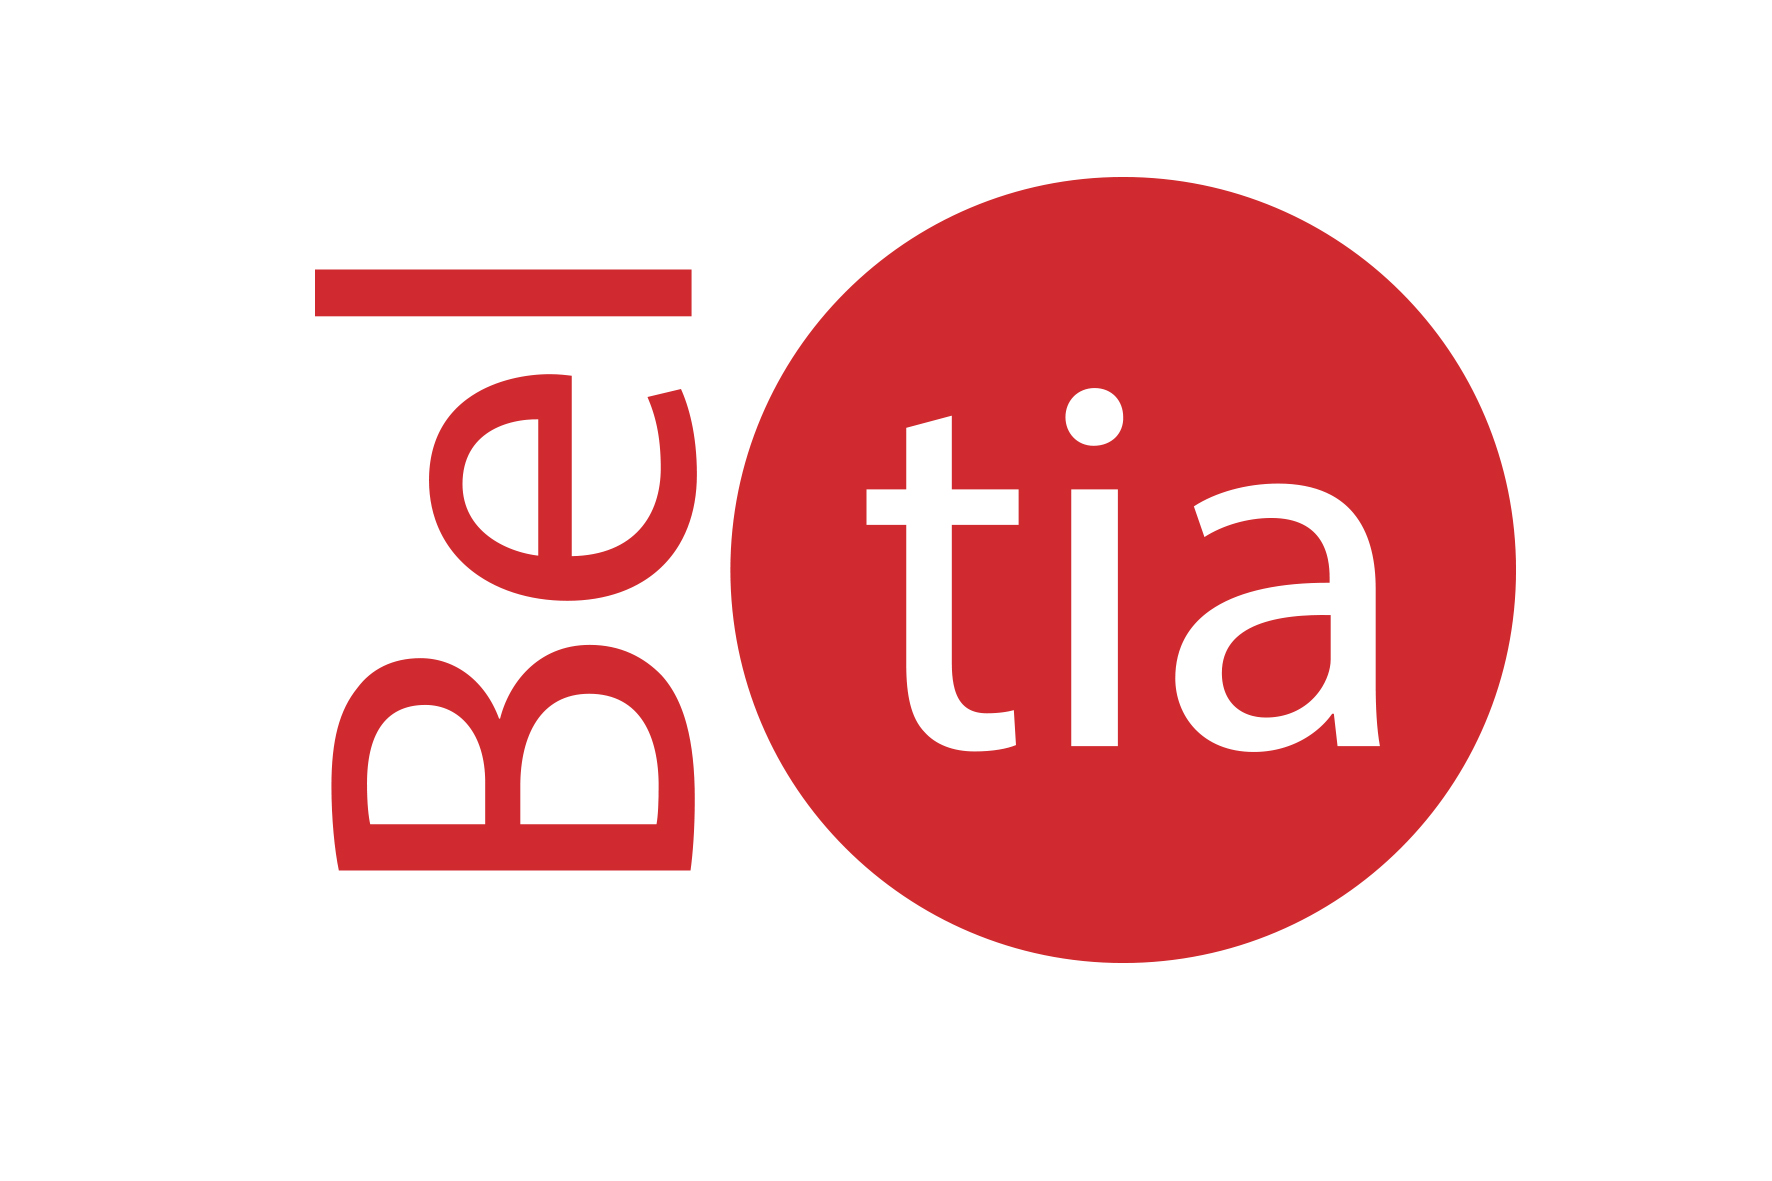 Beltia Project